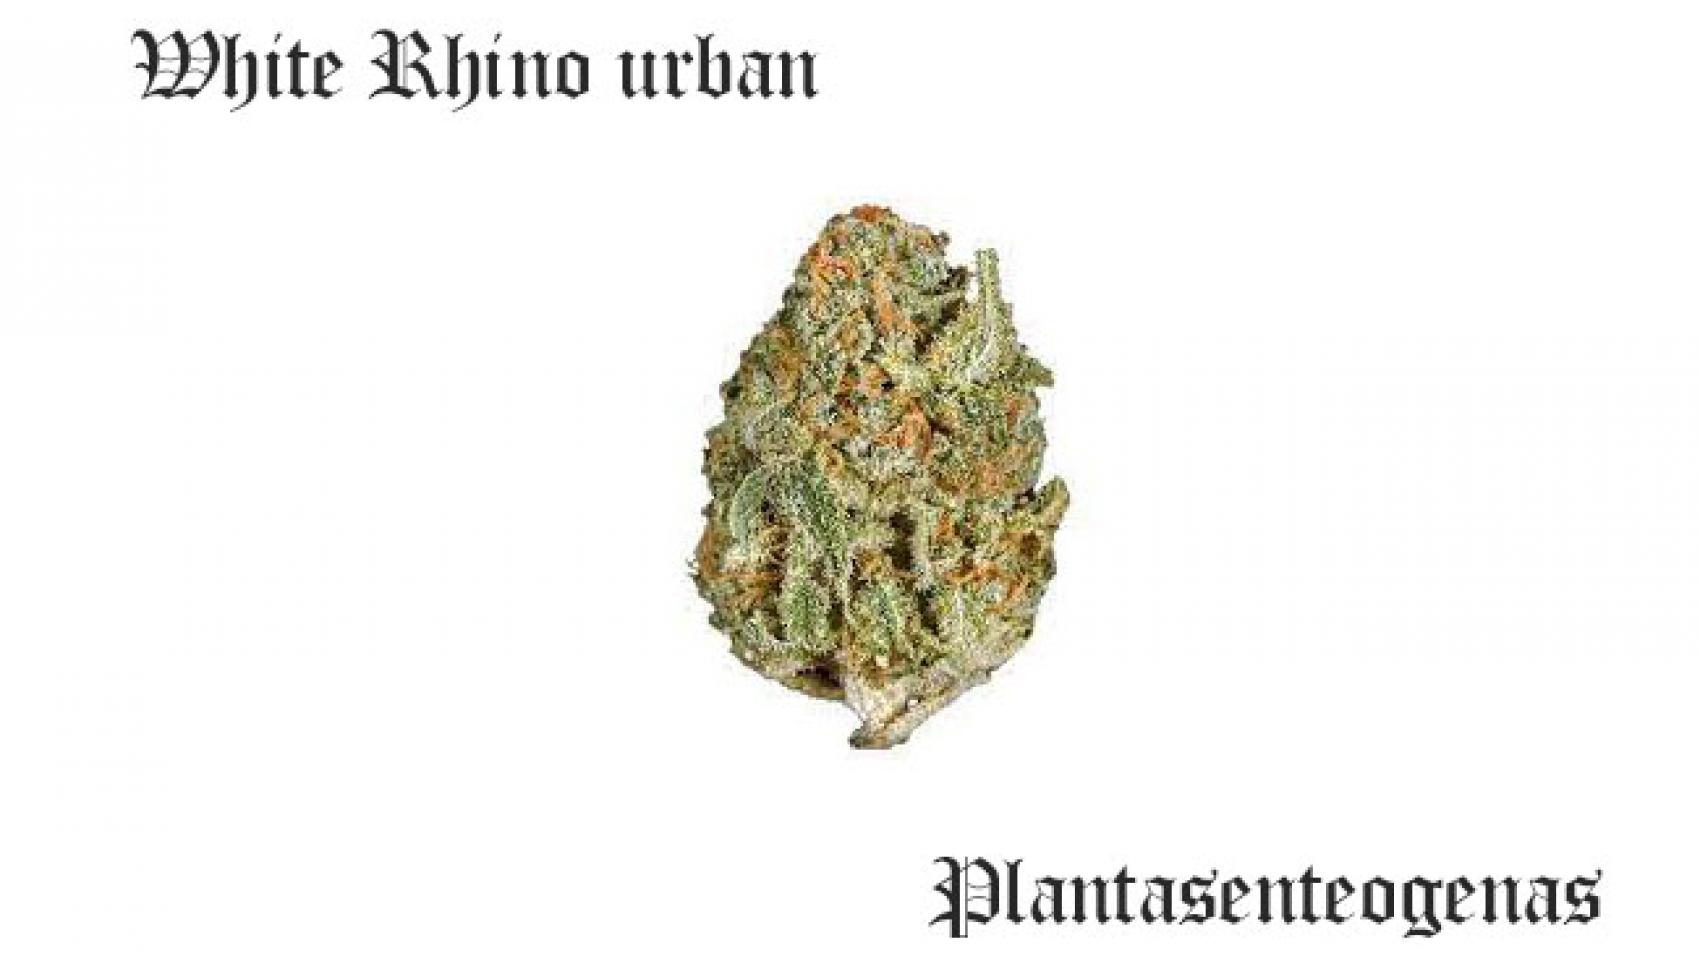 White Rhino urban